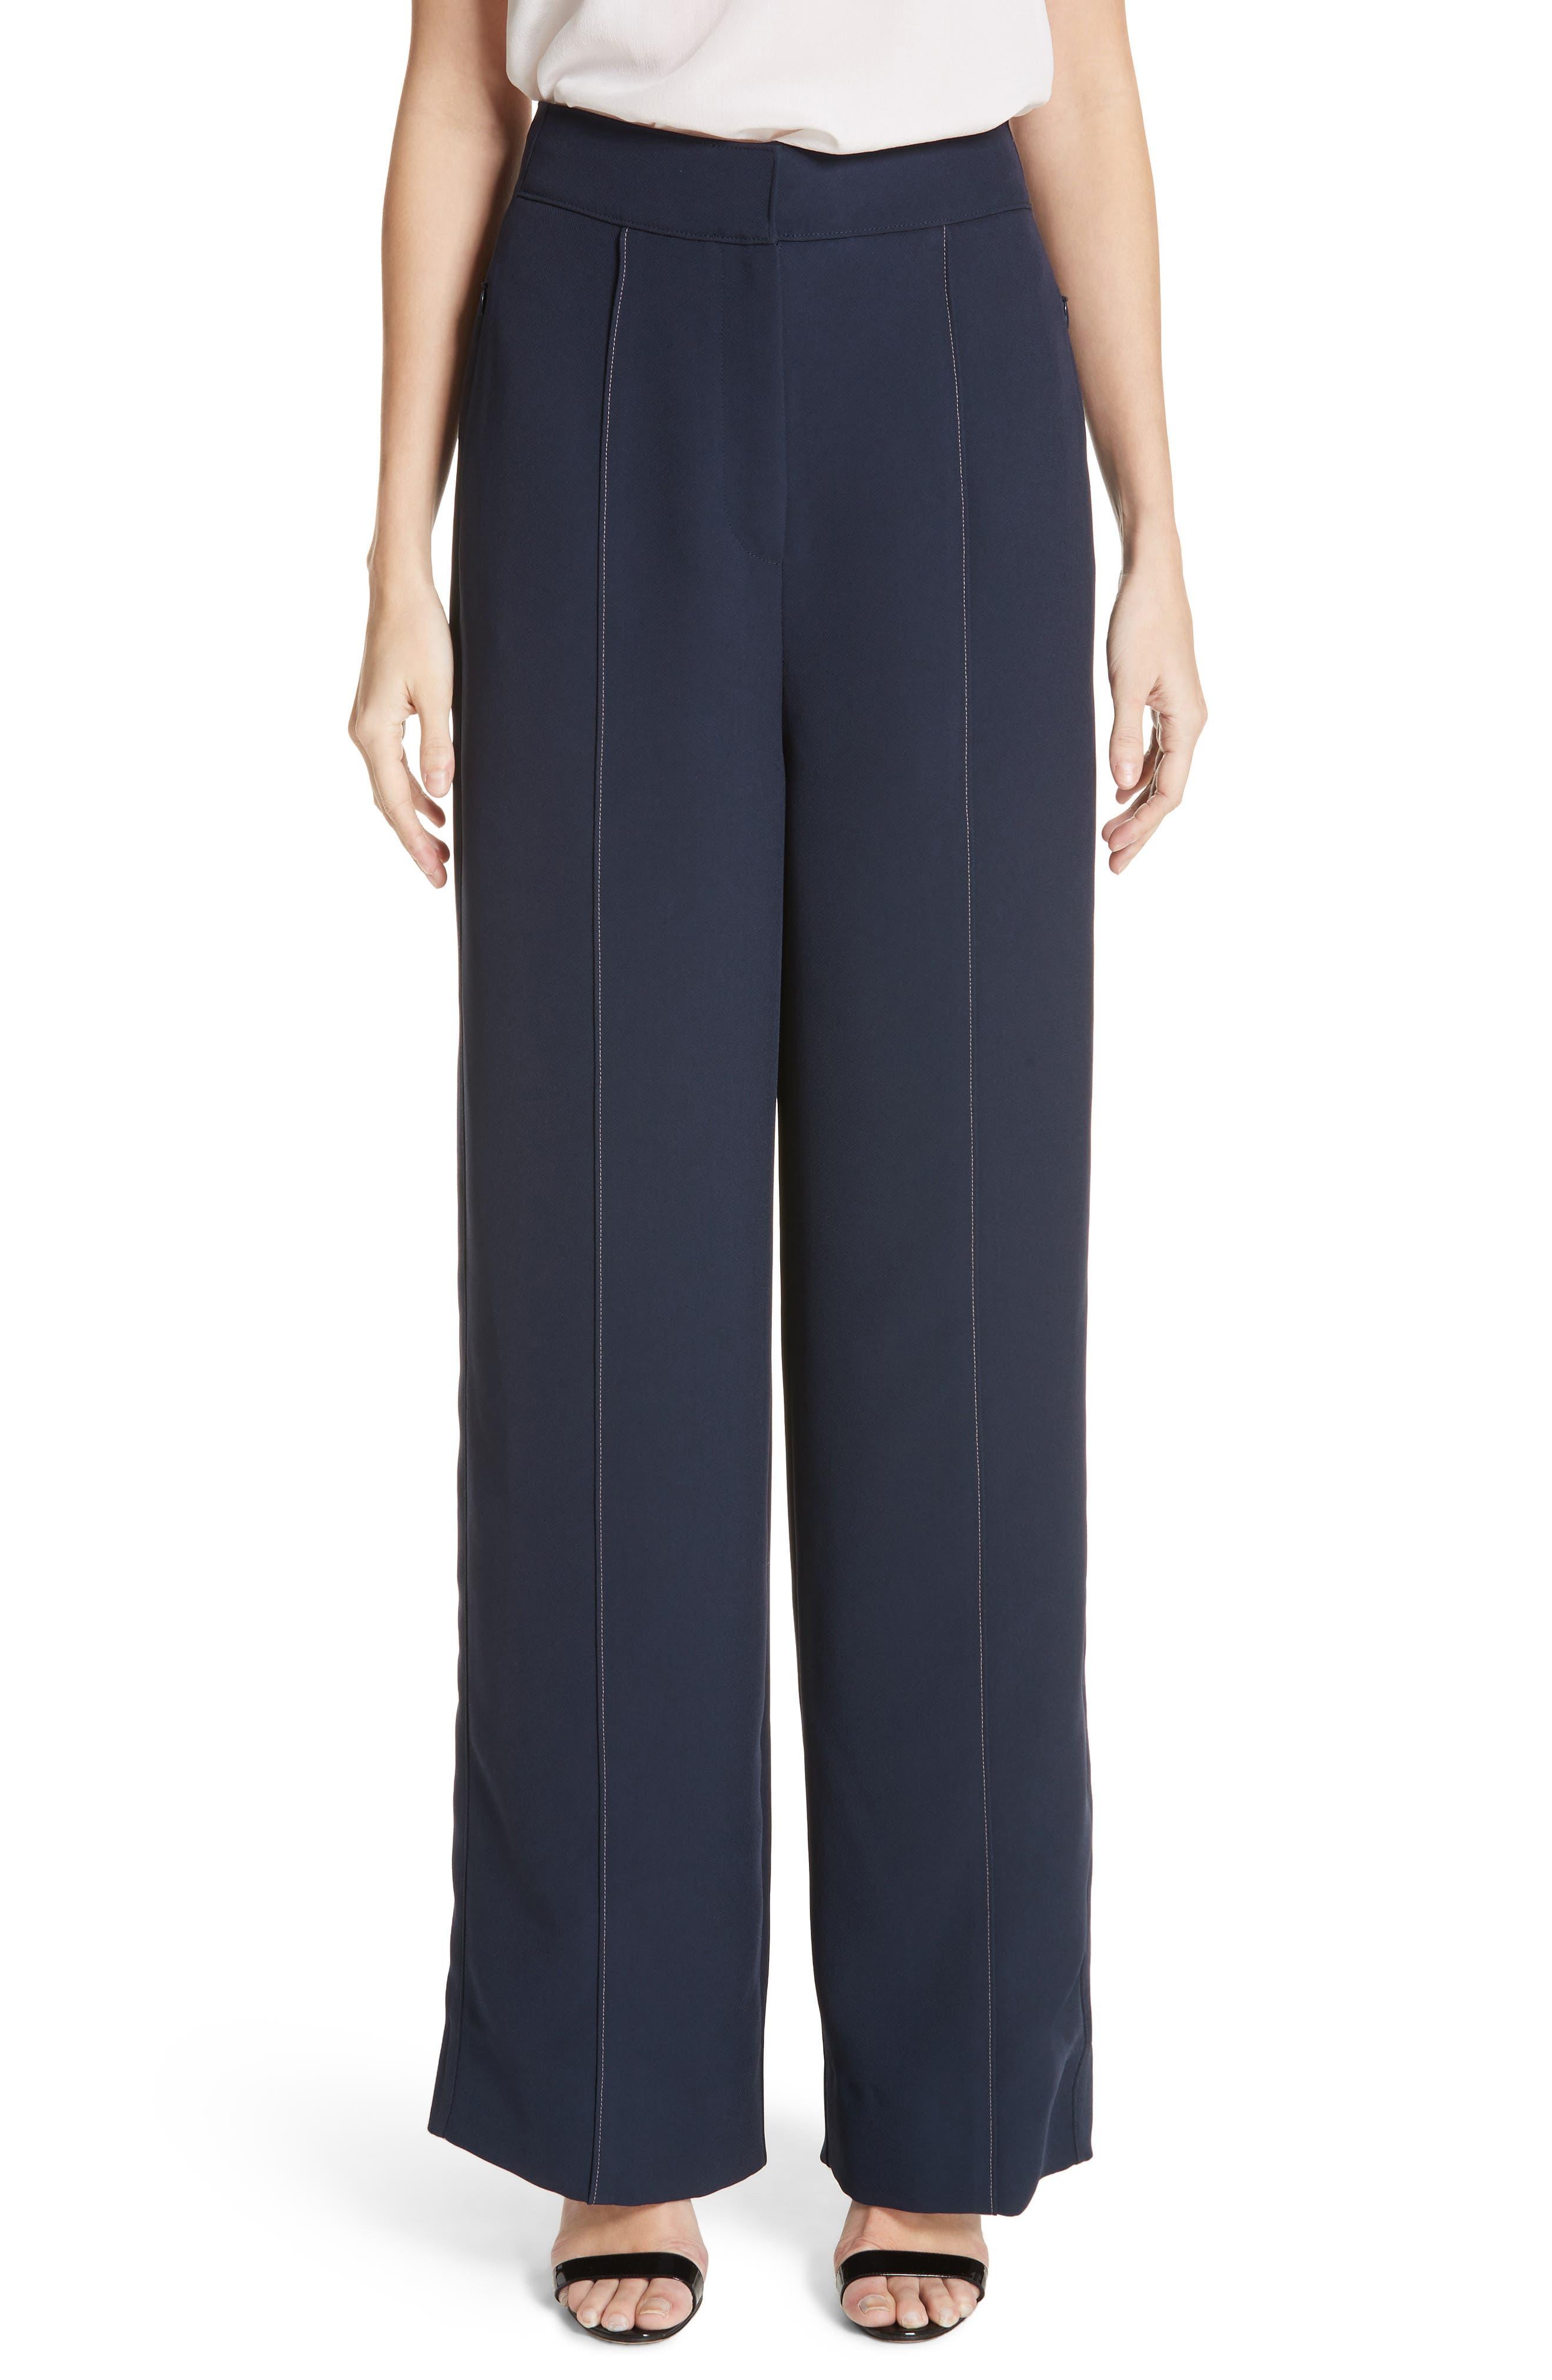 Lapari Pintuck Trousers,                         Main,                         color, Navy